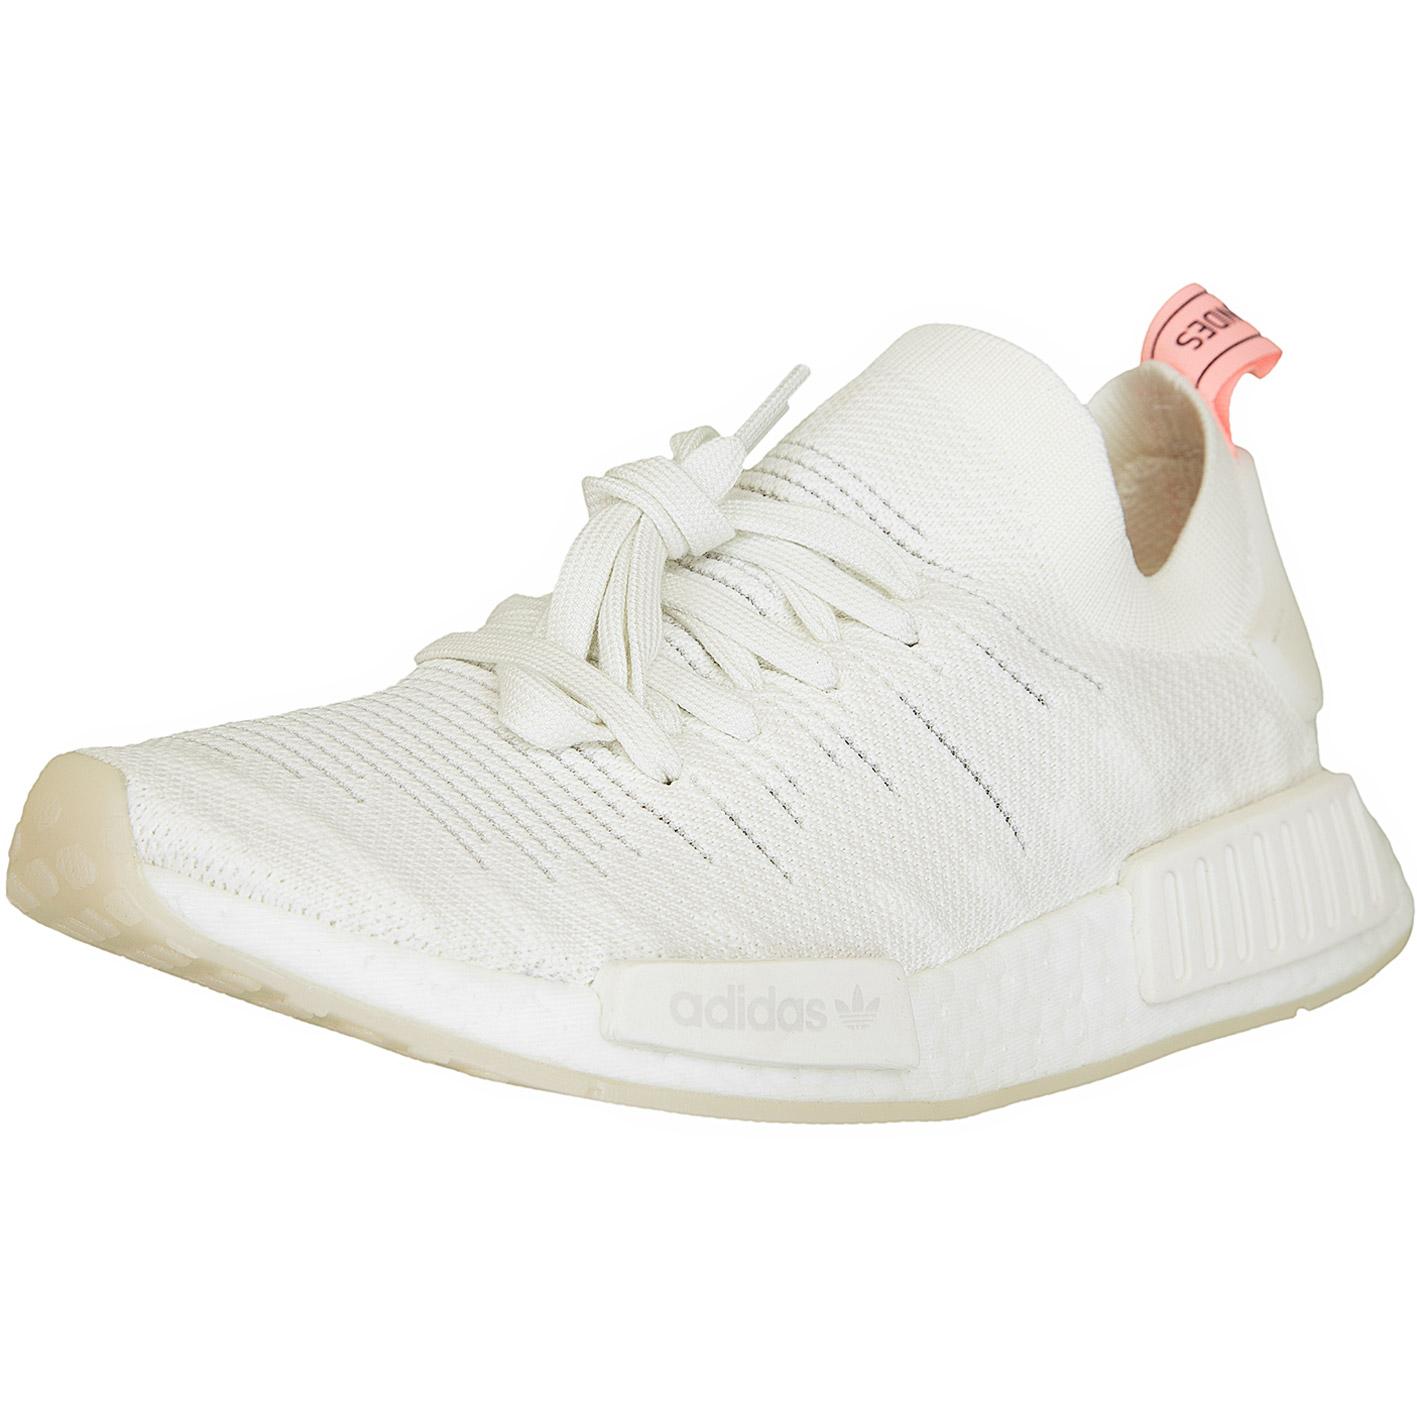 c466d55cf6f737 ☆ Adidas Originals Damen Sneaker NMD R1 STLT Primeknit cloud weiß ...